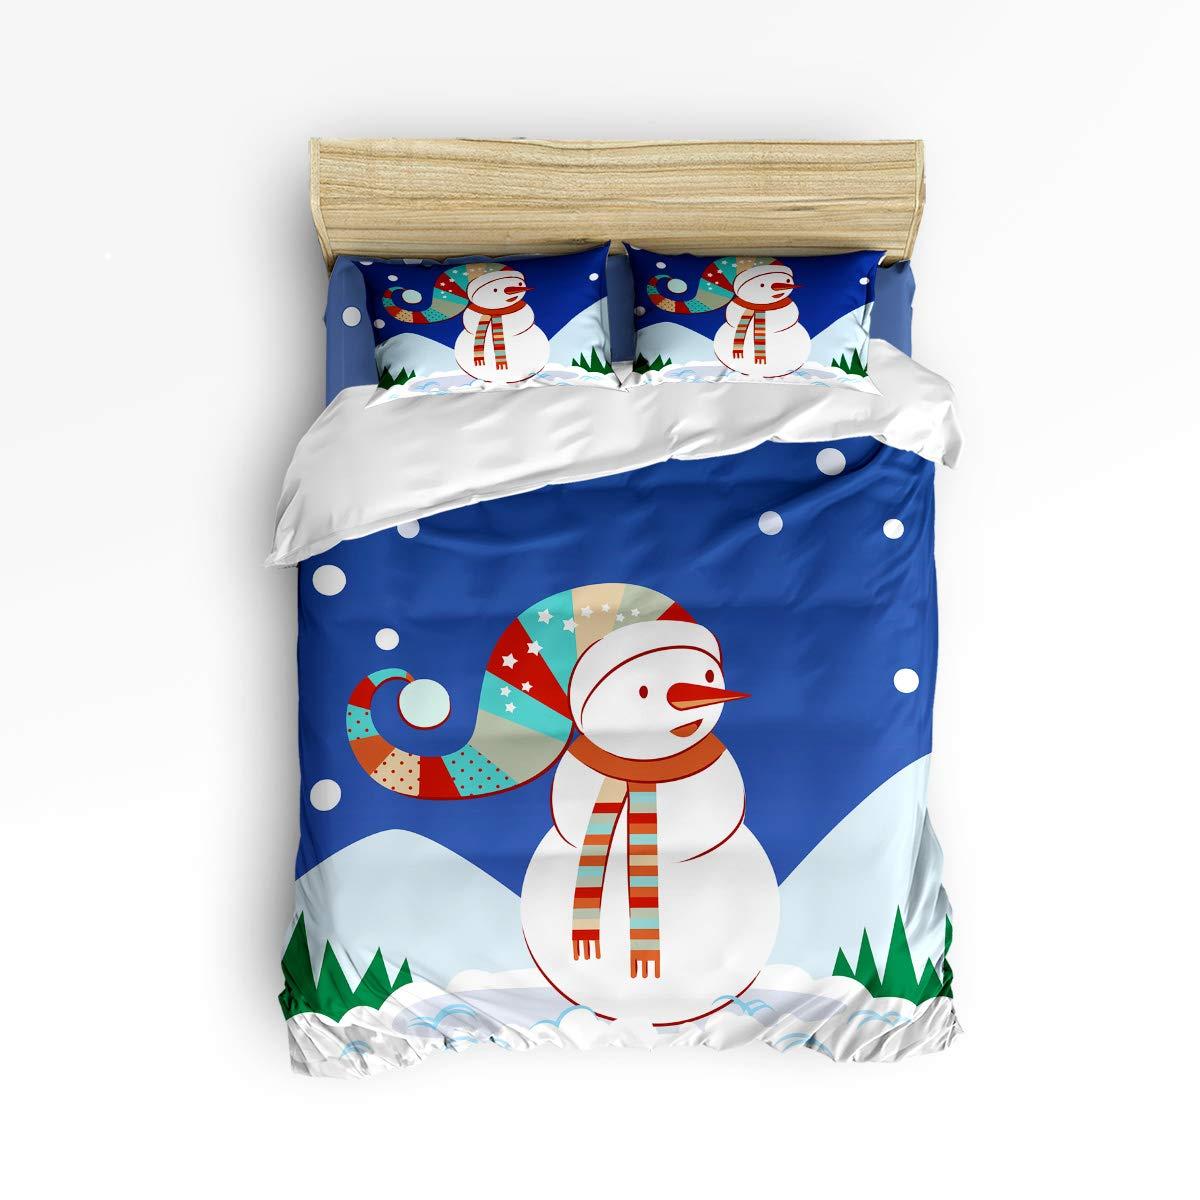 Anzona 4ピース 寝具セット 雪だるま スカーフとクリスマスハット 雪のイメージ 4ピース 羽毛布団カバーセット ベッドスプレッド デイベッド 子供/ティーン/大人用 フルサイズ 181031SJTzlyANZONA-SWTQ00592SJTBAZN B07K442PXW Snowman17azn7739 フルサイズ